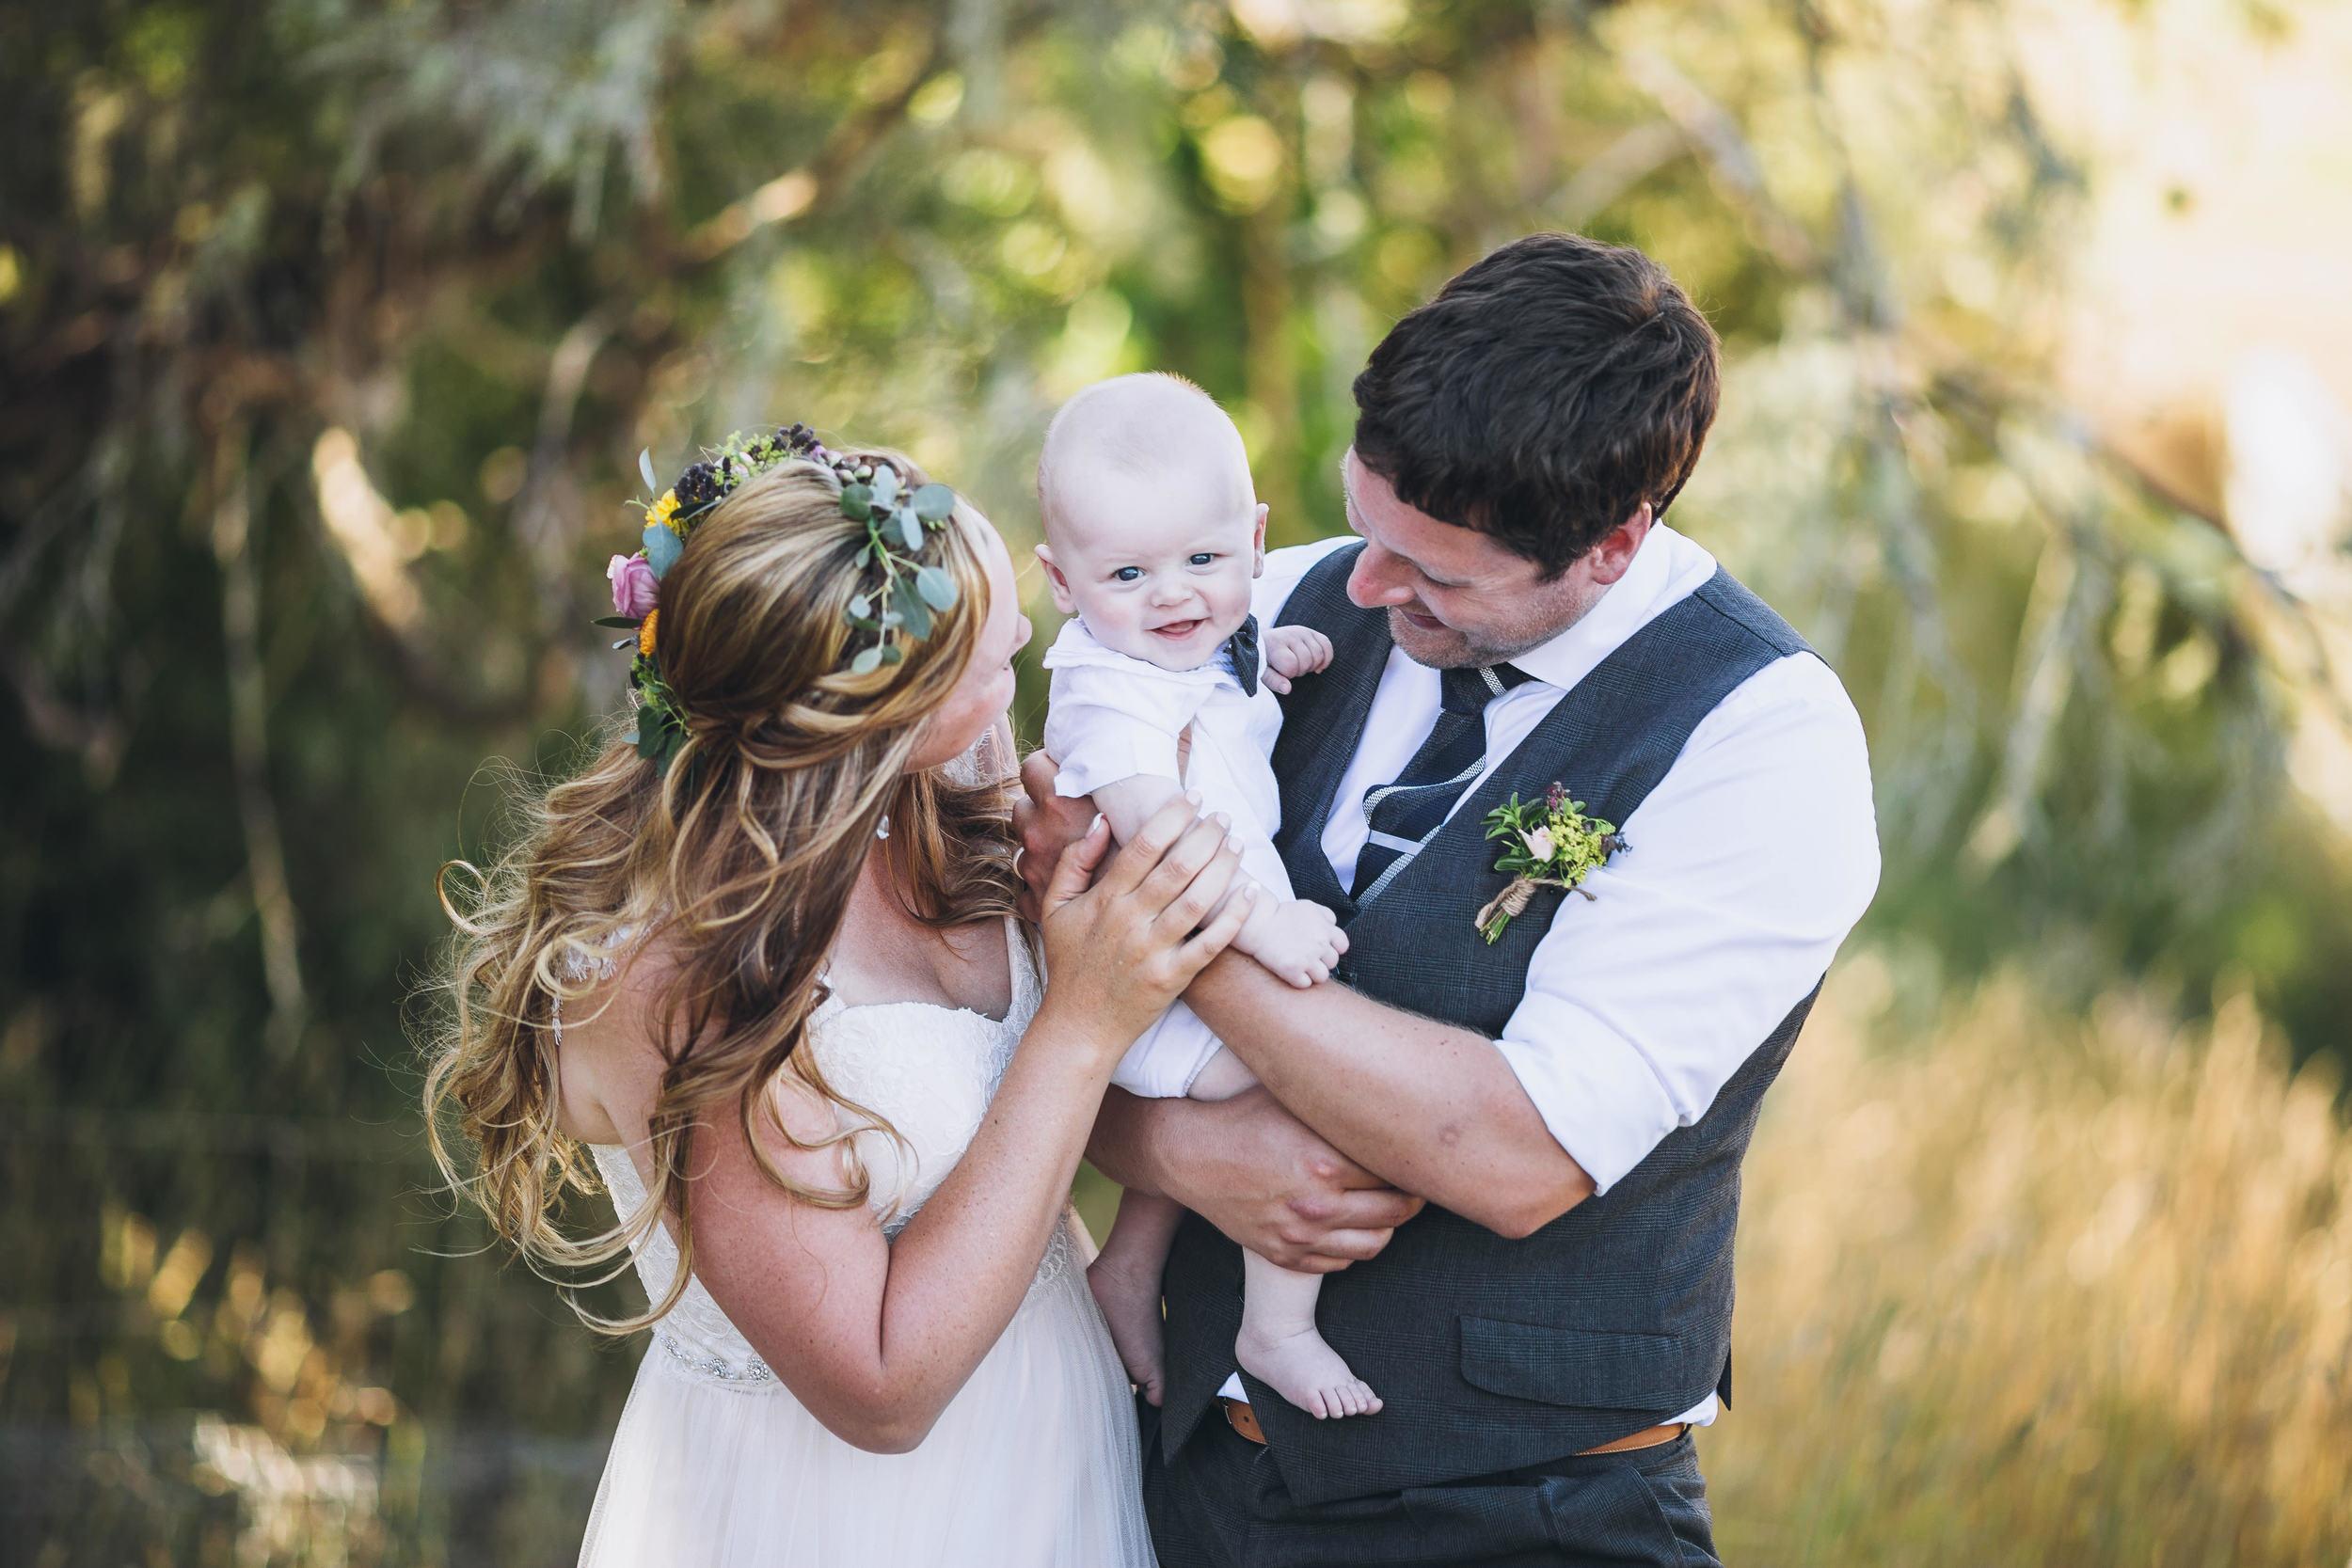 Lancewood Villa Wedding - Nelson Wedding Photography - Nelson Wedding Photographers - The Woods Photography